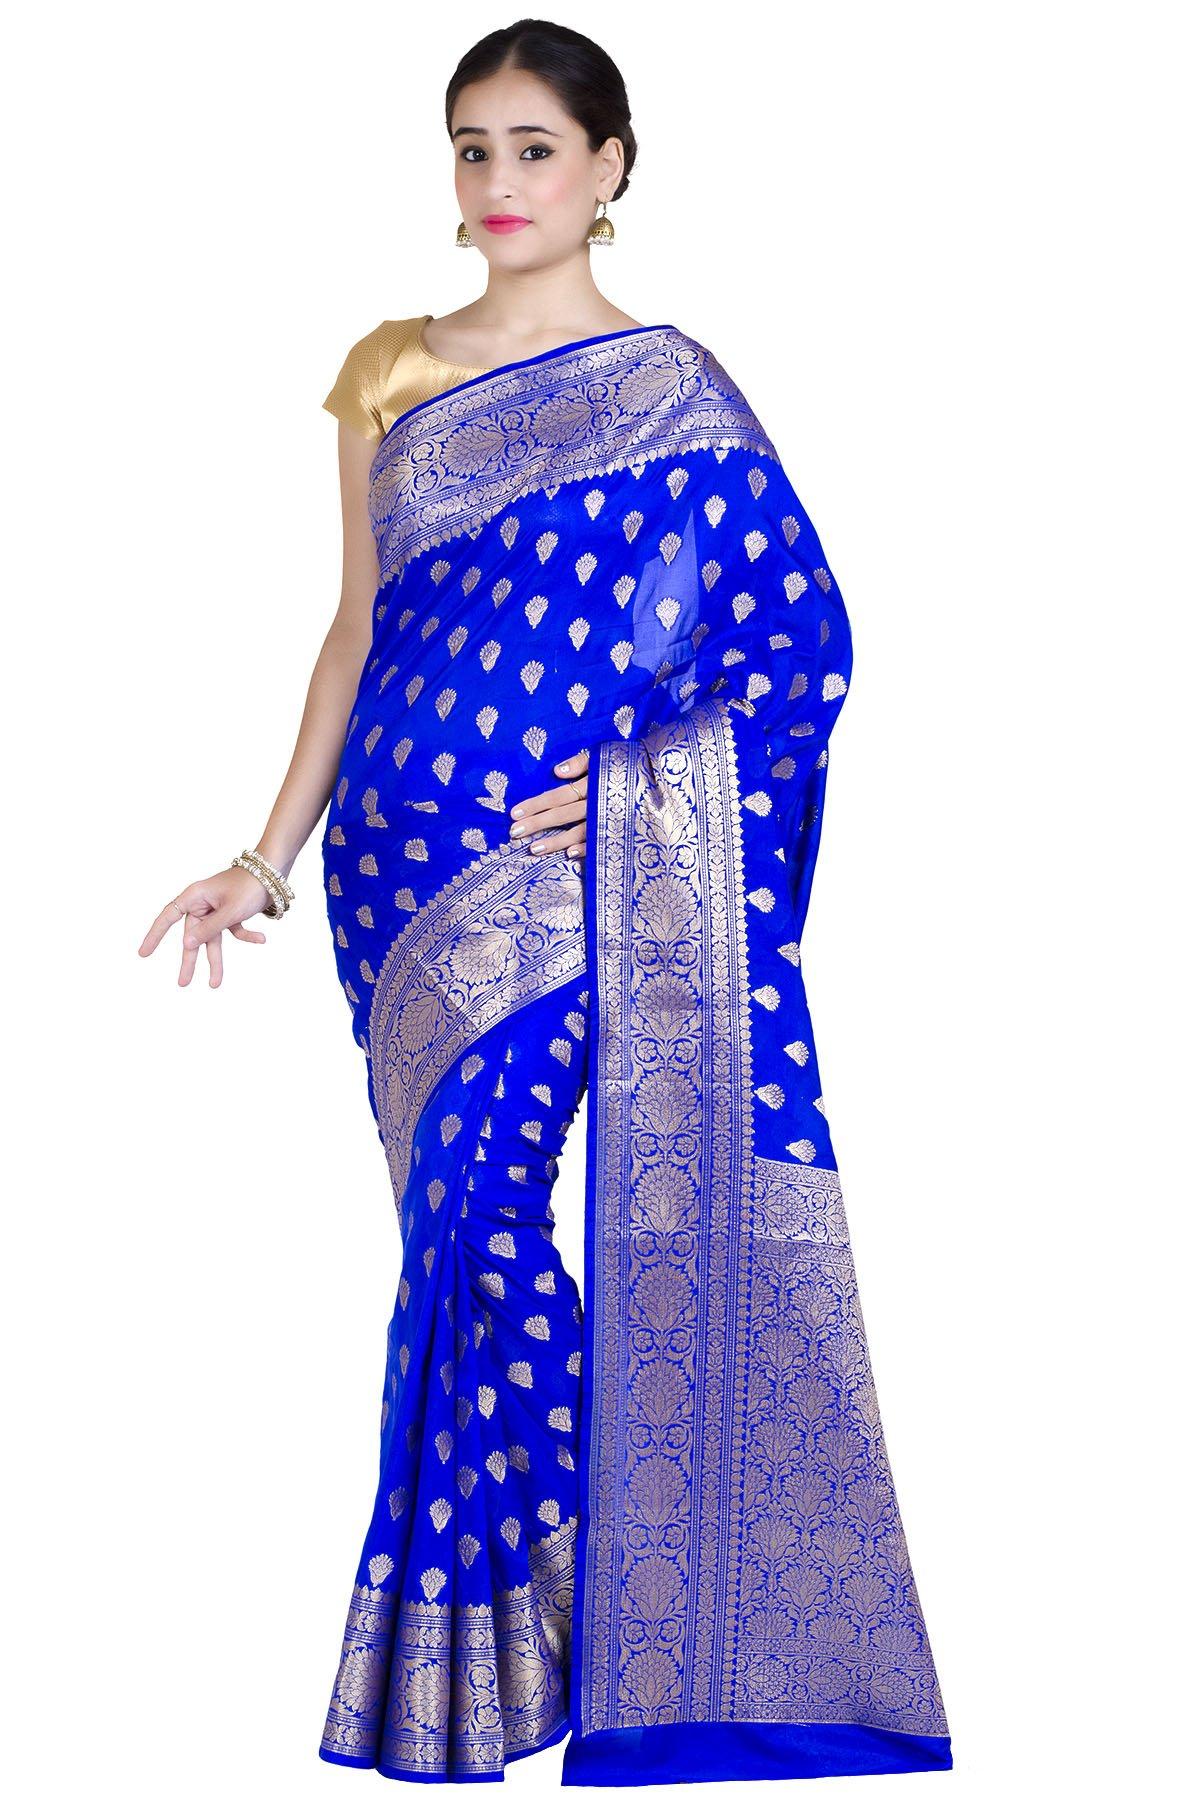 Chandrakala Women's Royal Blue Kataan Silk Banarasi Saree